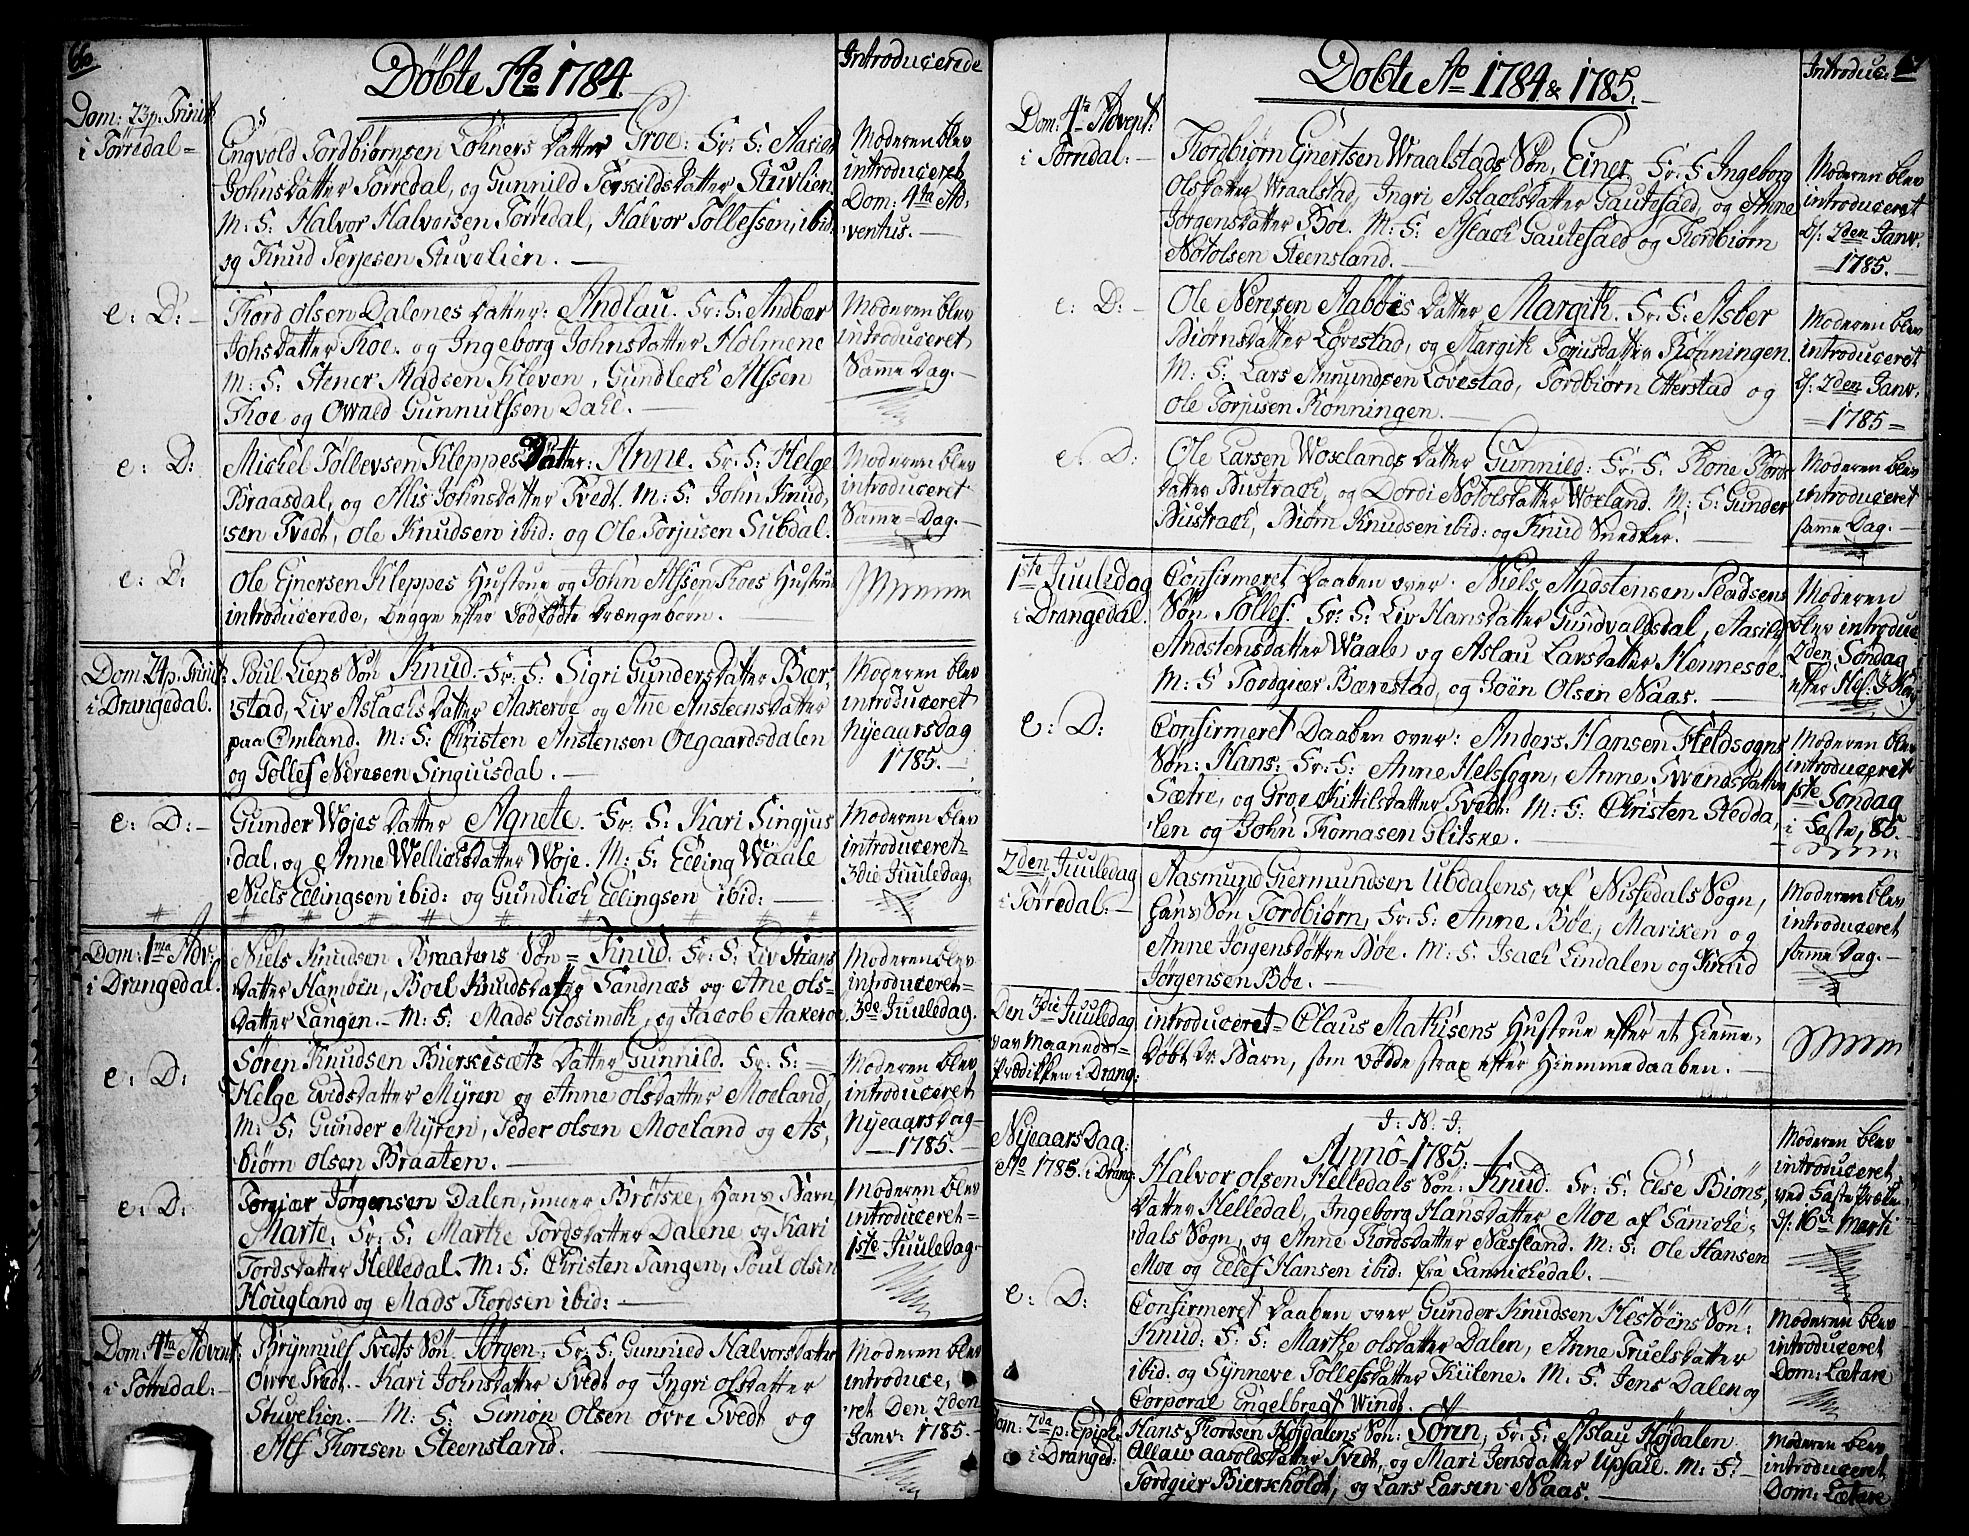 SAKO, Drangedal kirkebøker, F/Fa/L0003: Ministerialbok nr. 3, 1768-1814, s. 66-67